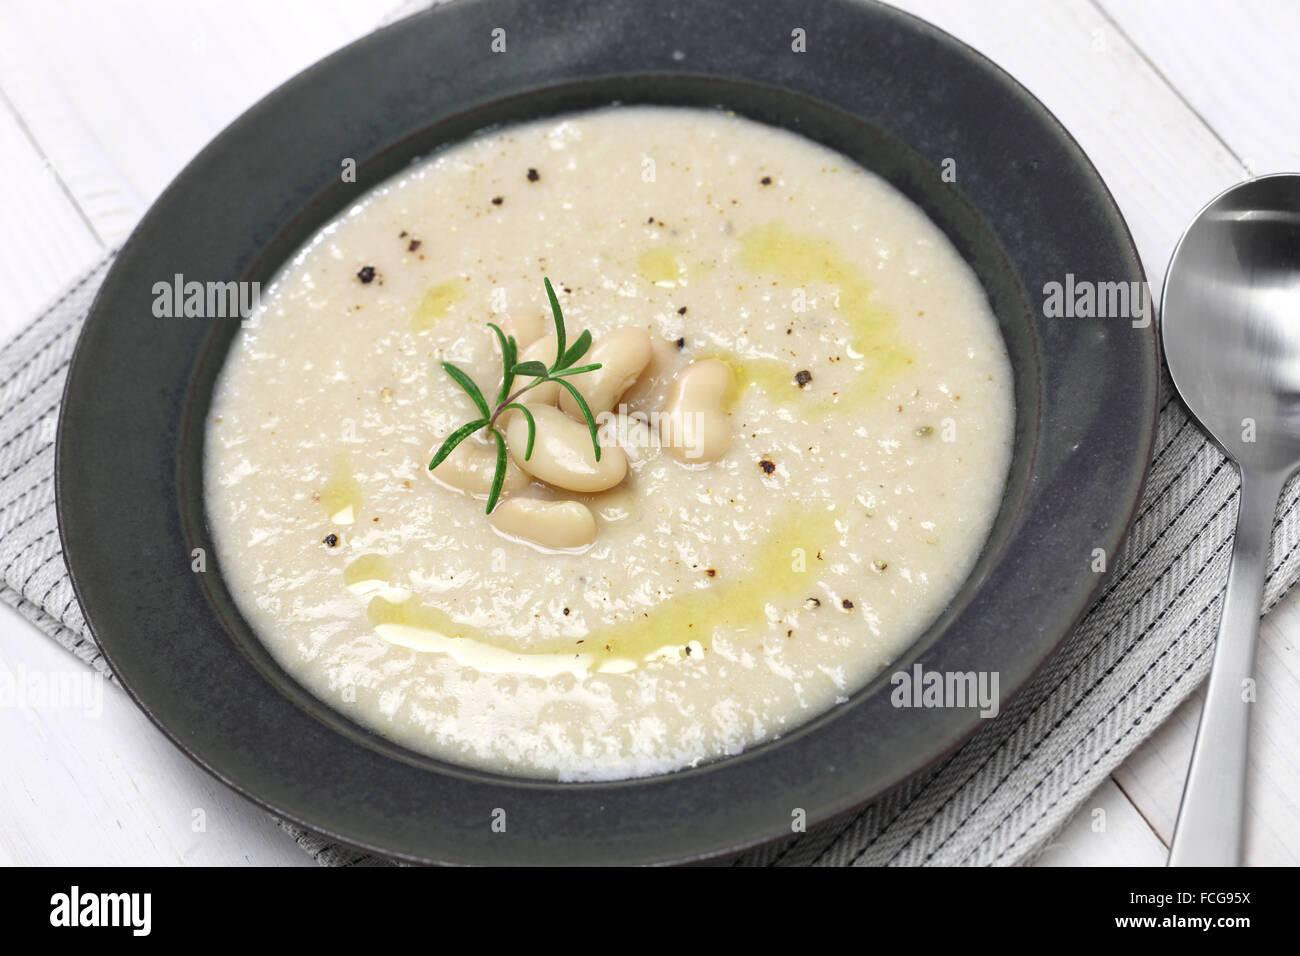 tuscan creamy cannellini bean soup, italian cuisine - Stock Image